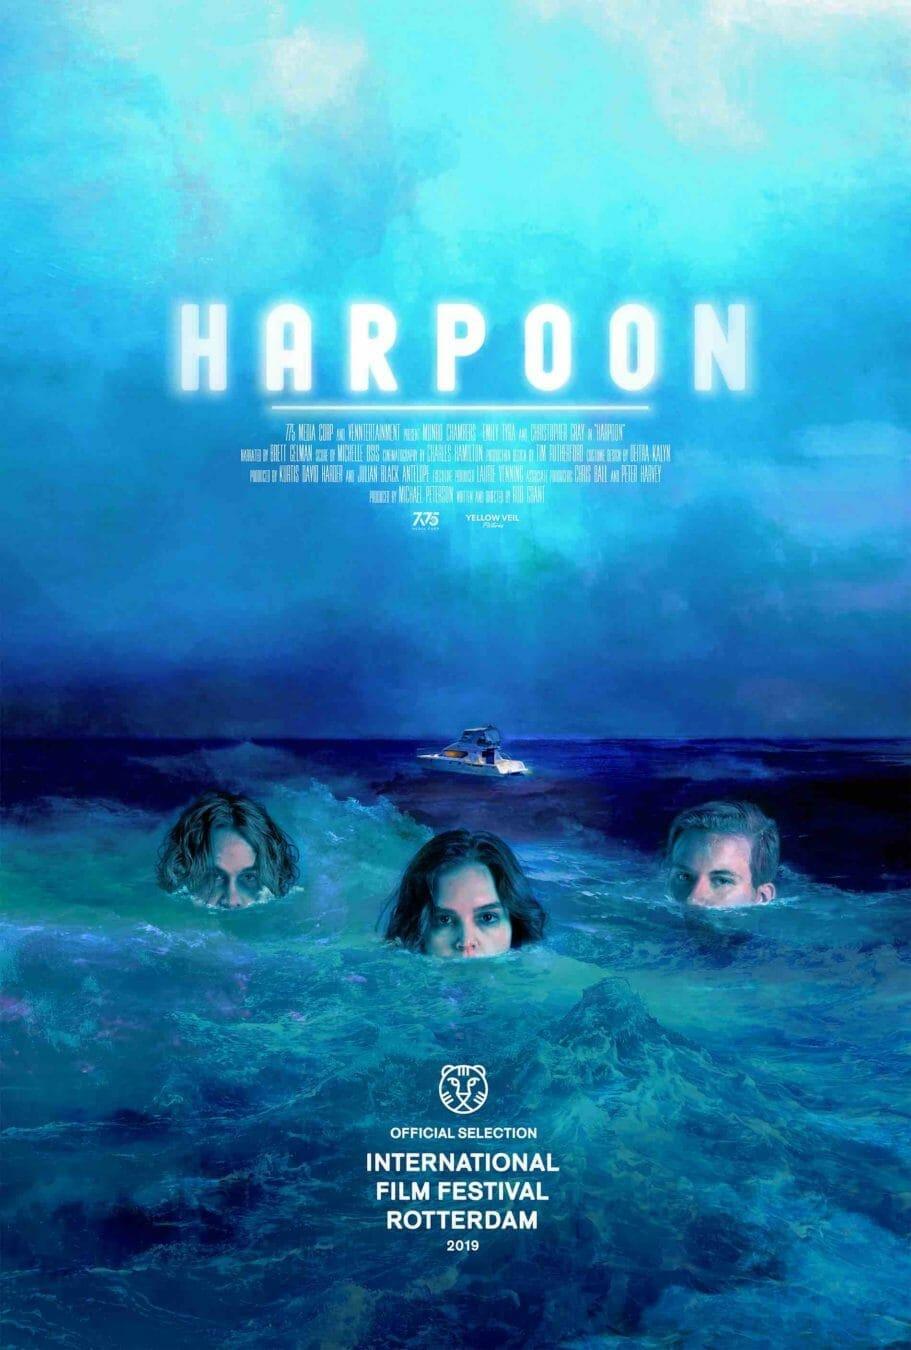 harpoon movie 2019 dread